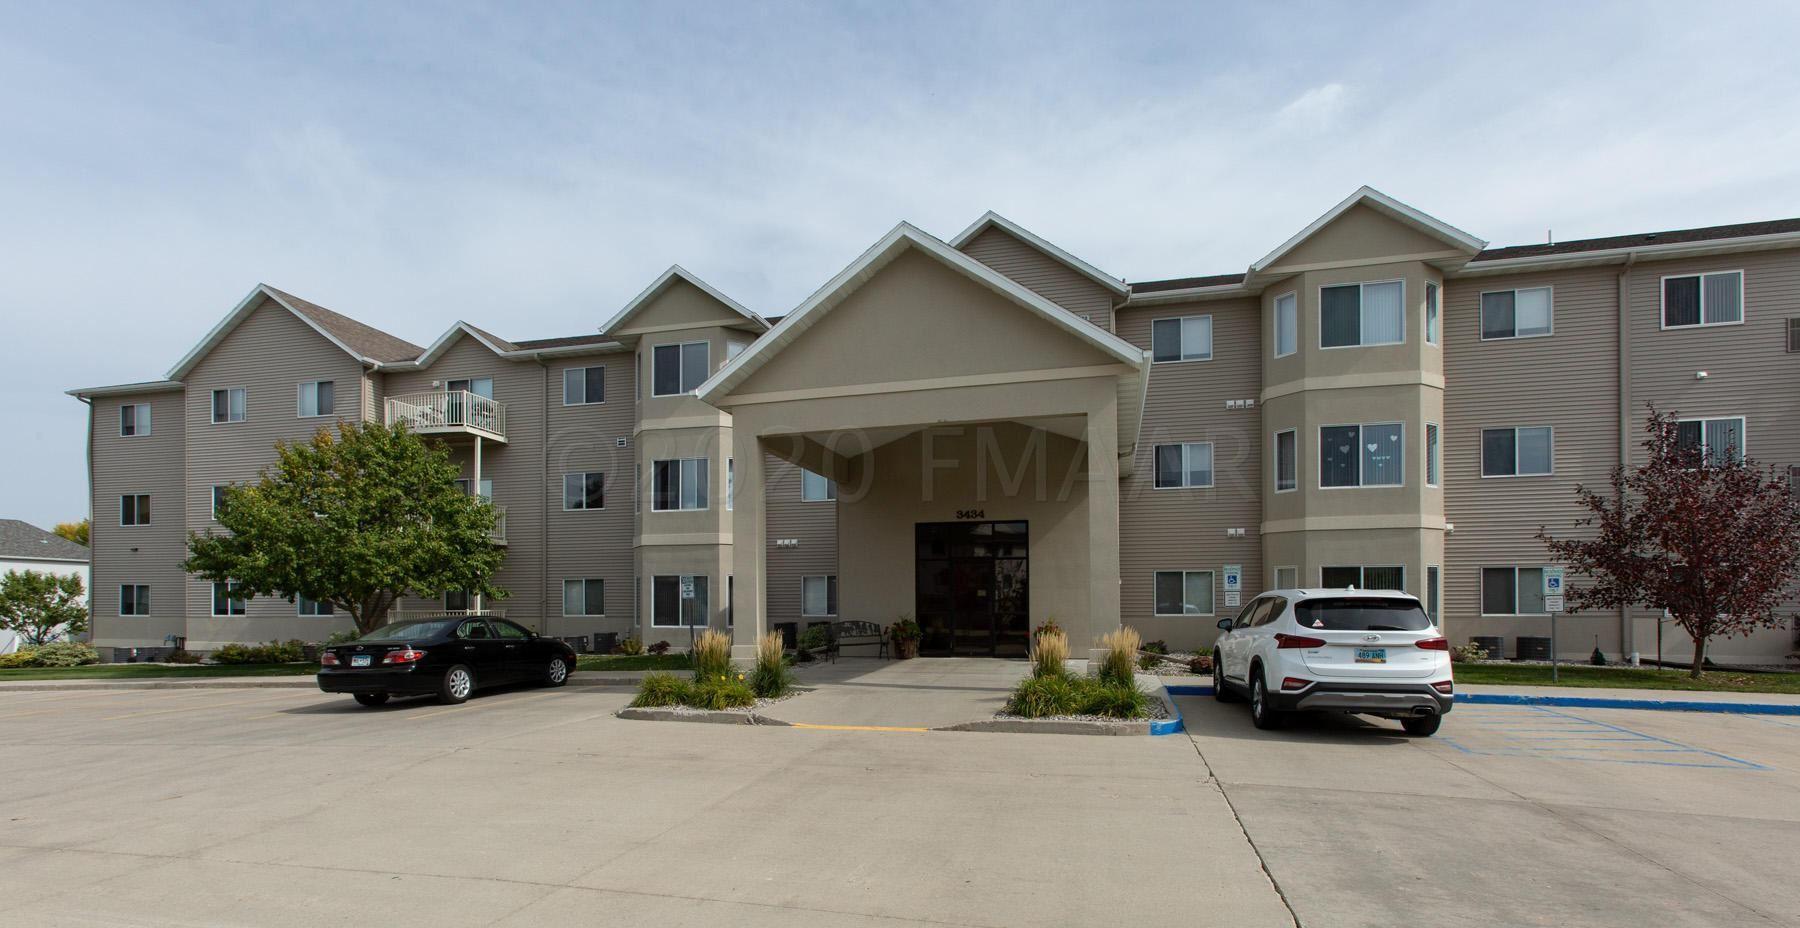 3434 28TH Street SW #305, Fargo, ND 58104 - #: 20-5653